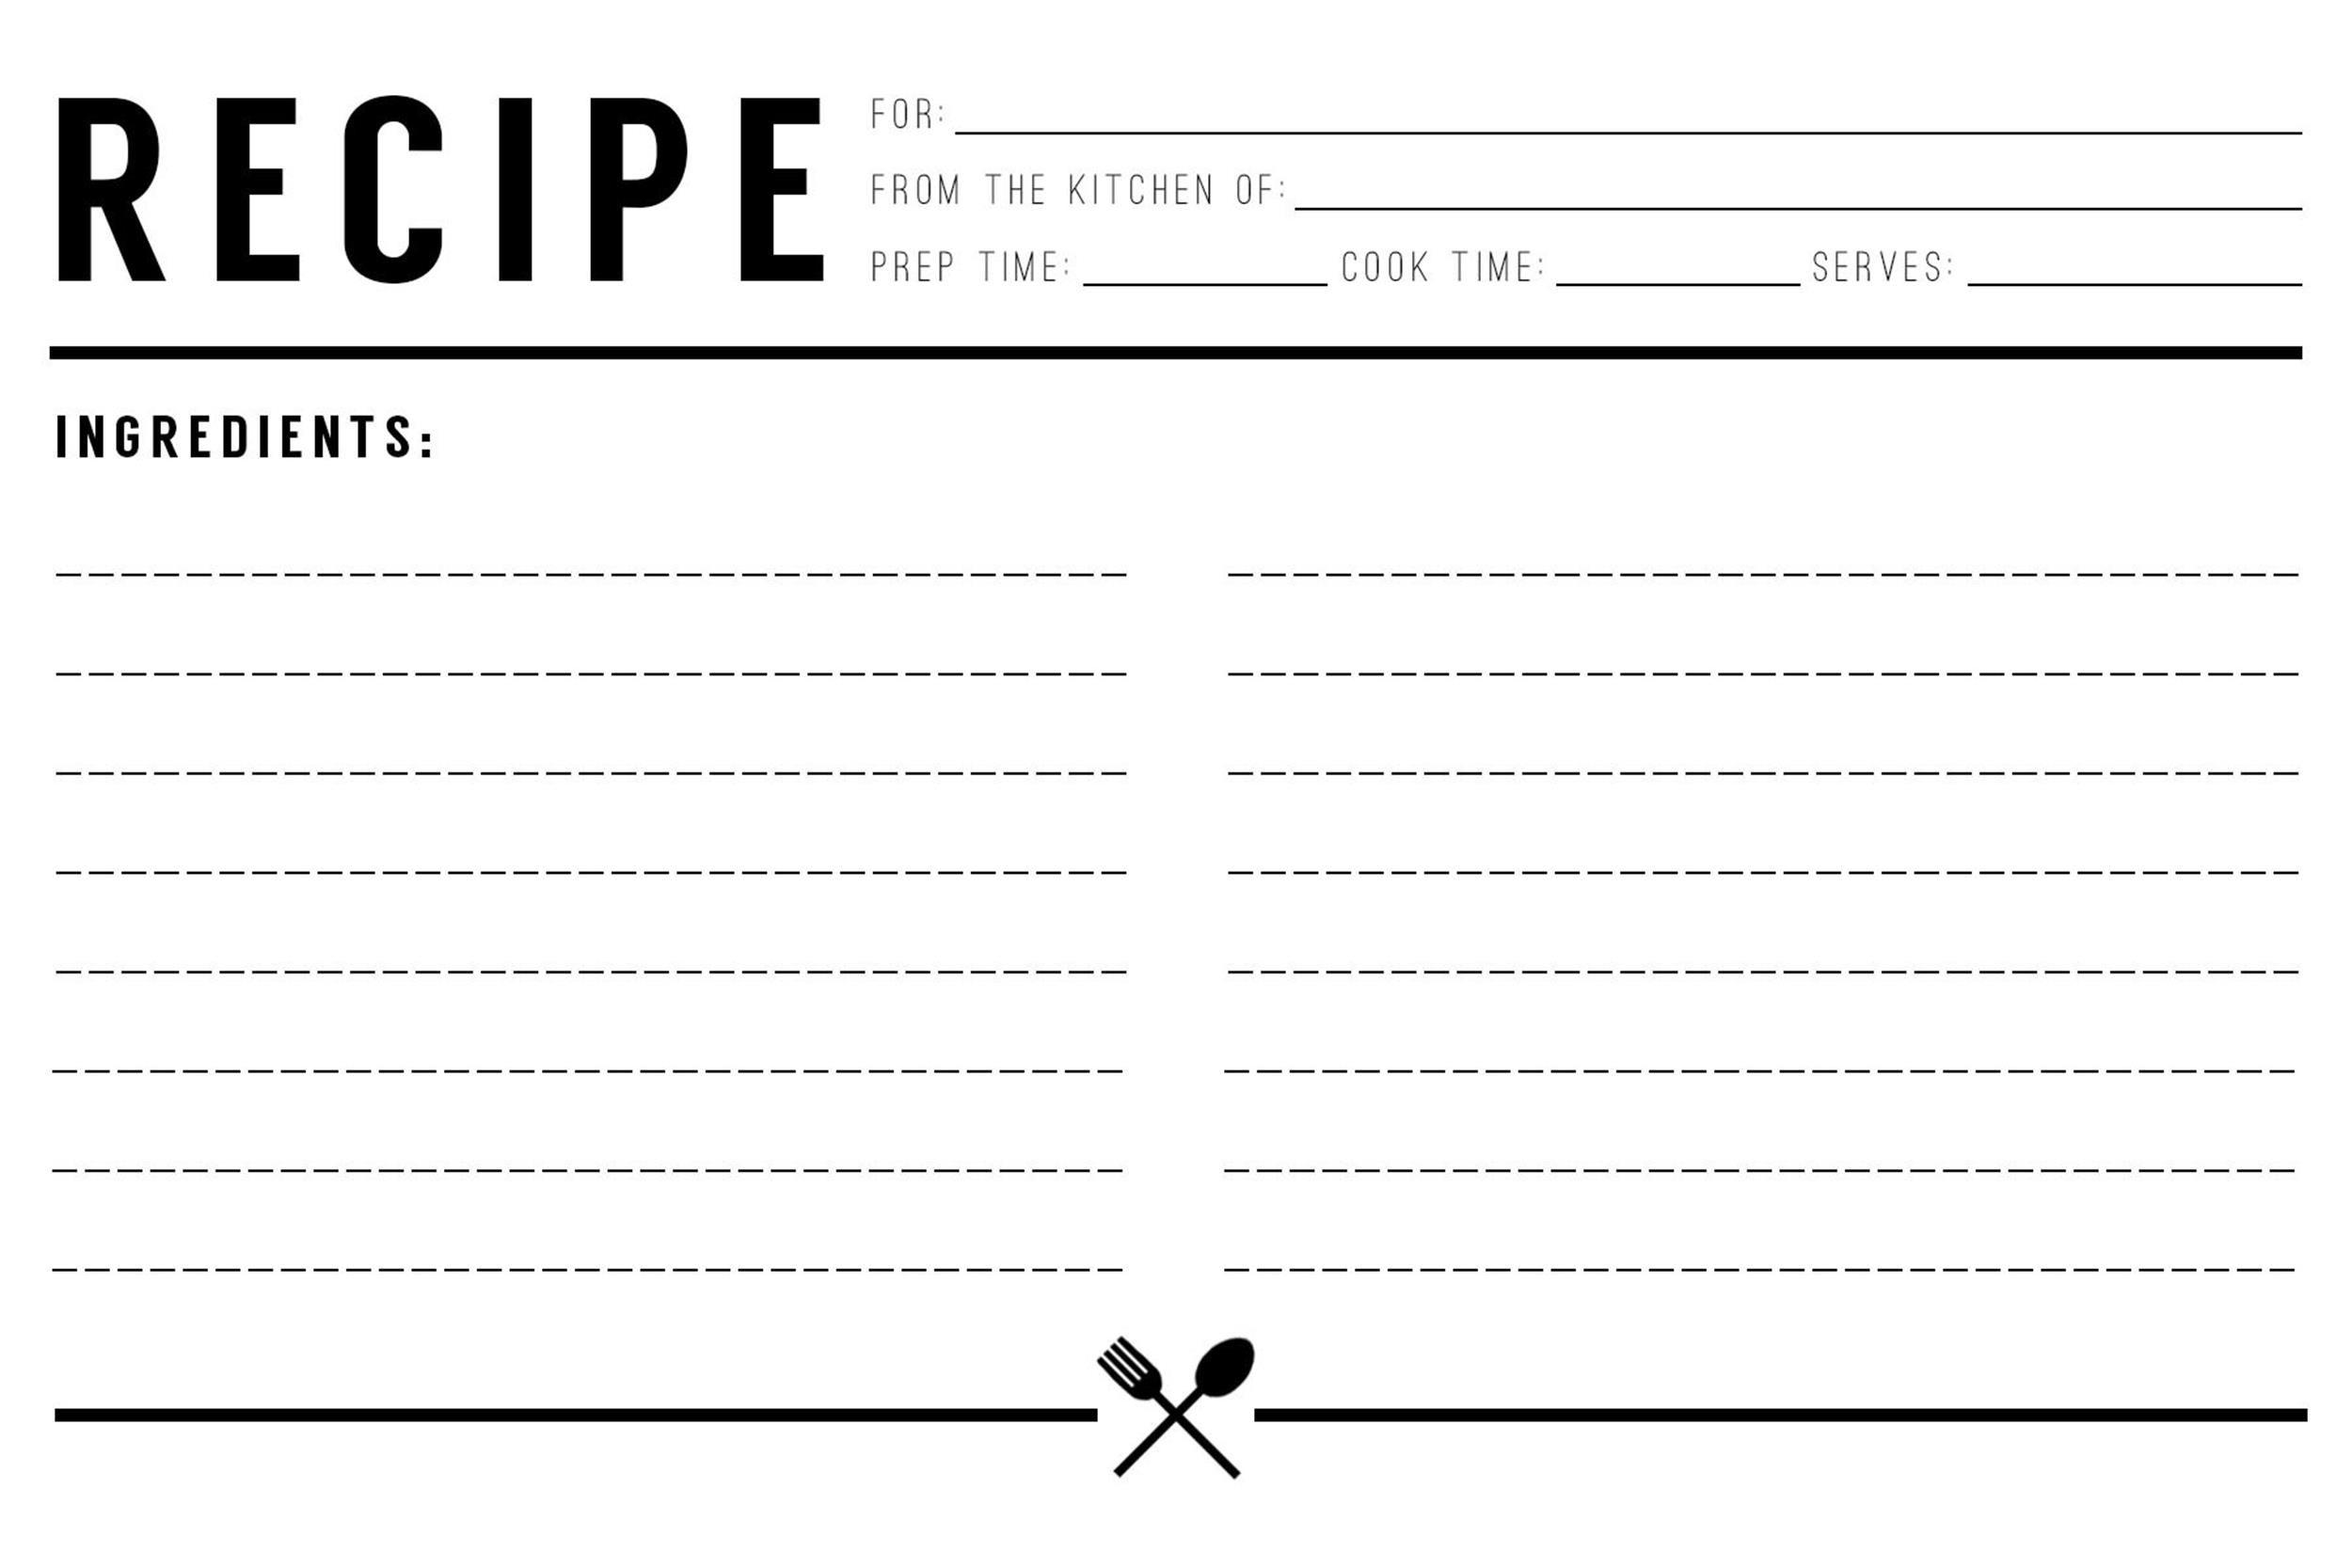 005 Sensational M Word Recipe Template Idea  Microsoft Card 2010 Full PageFull